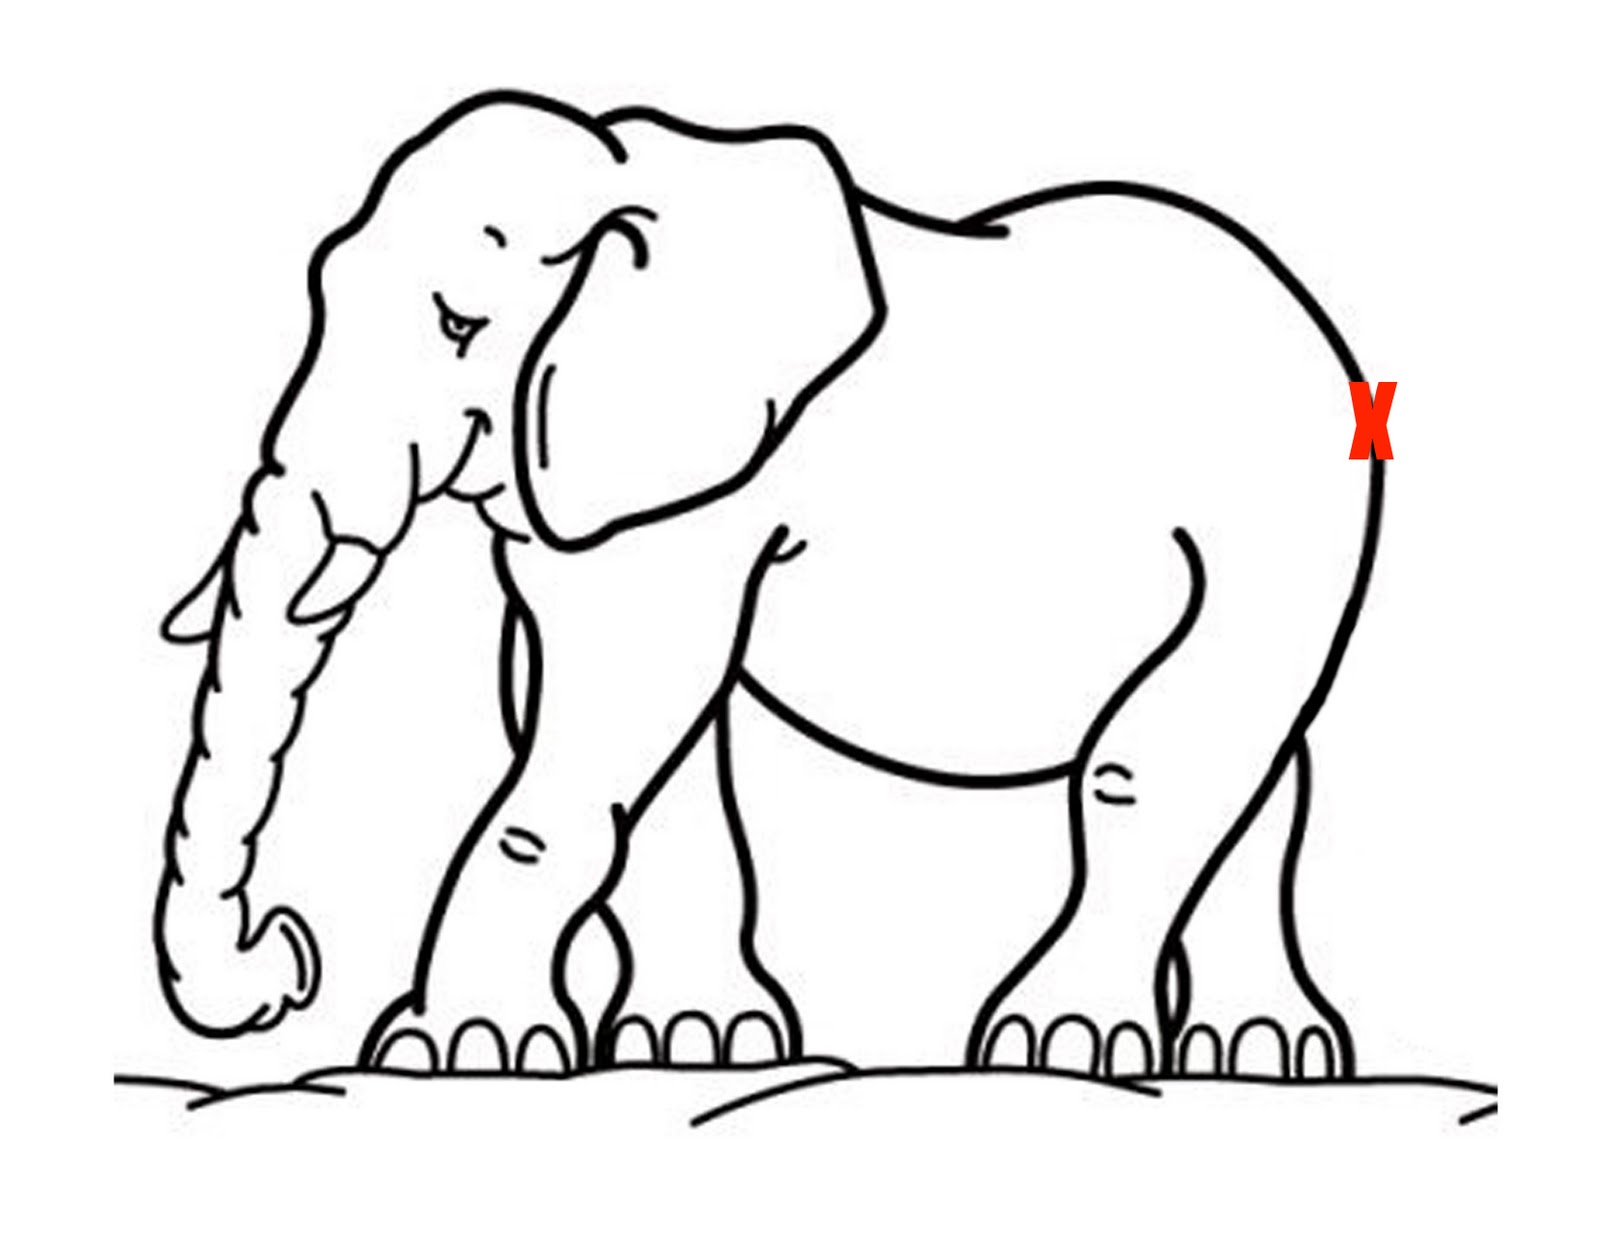 The Heath Bar: Pin The Tail On The Elephant